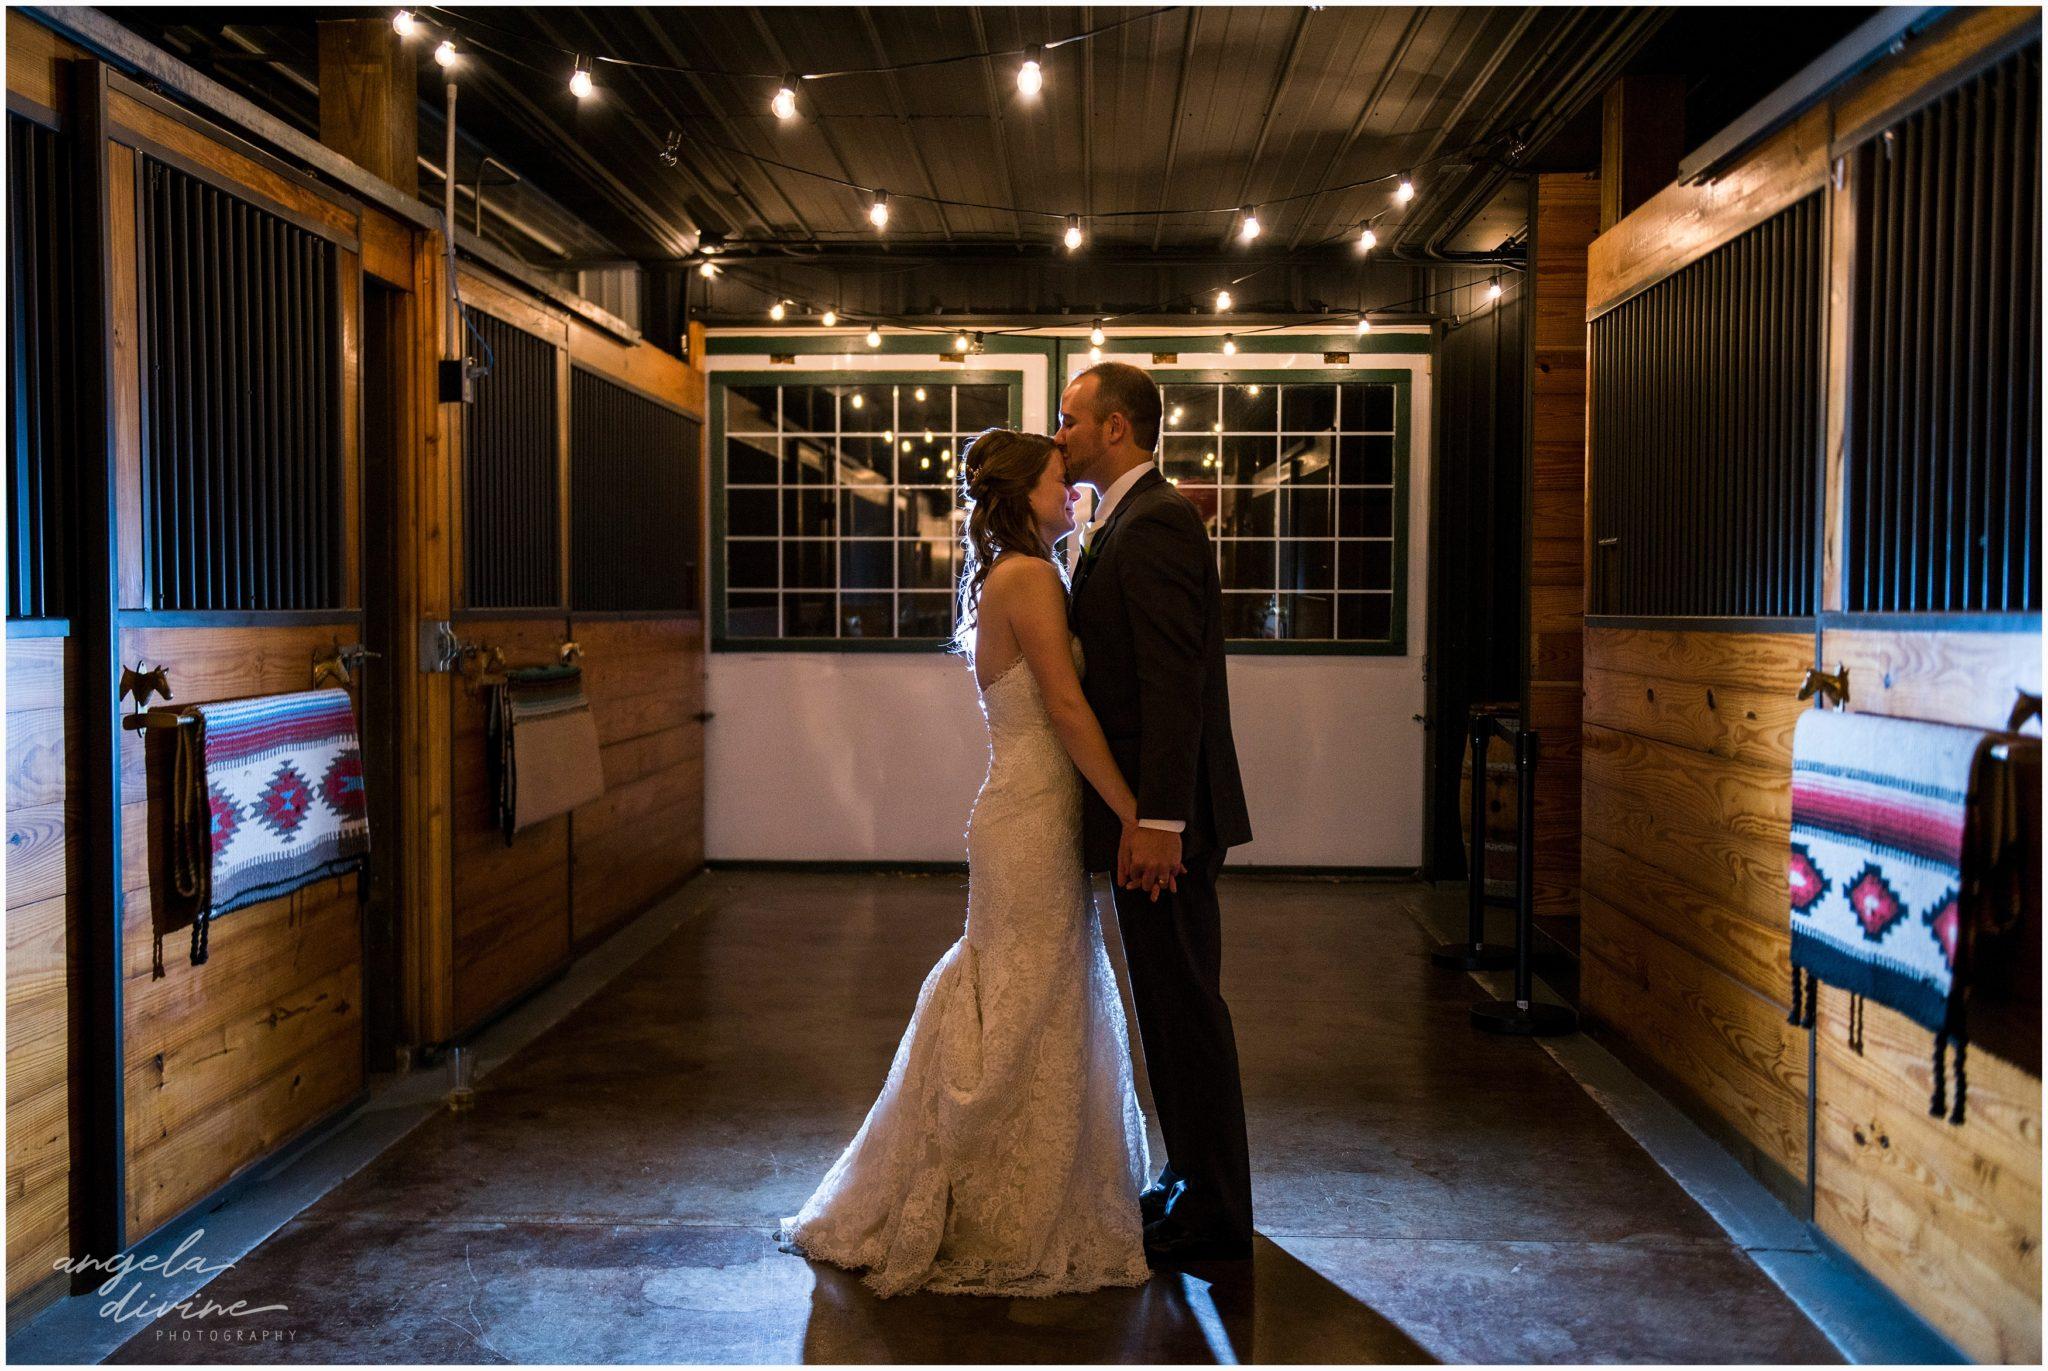 Carlos Creek Winery wedding night photography